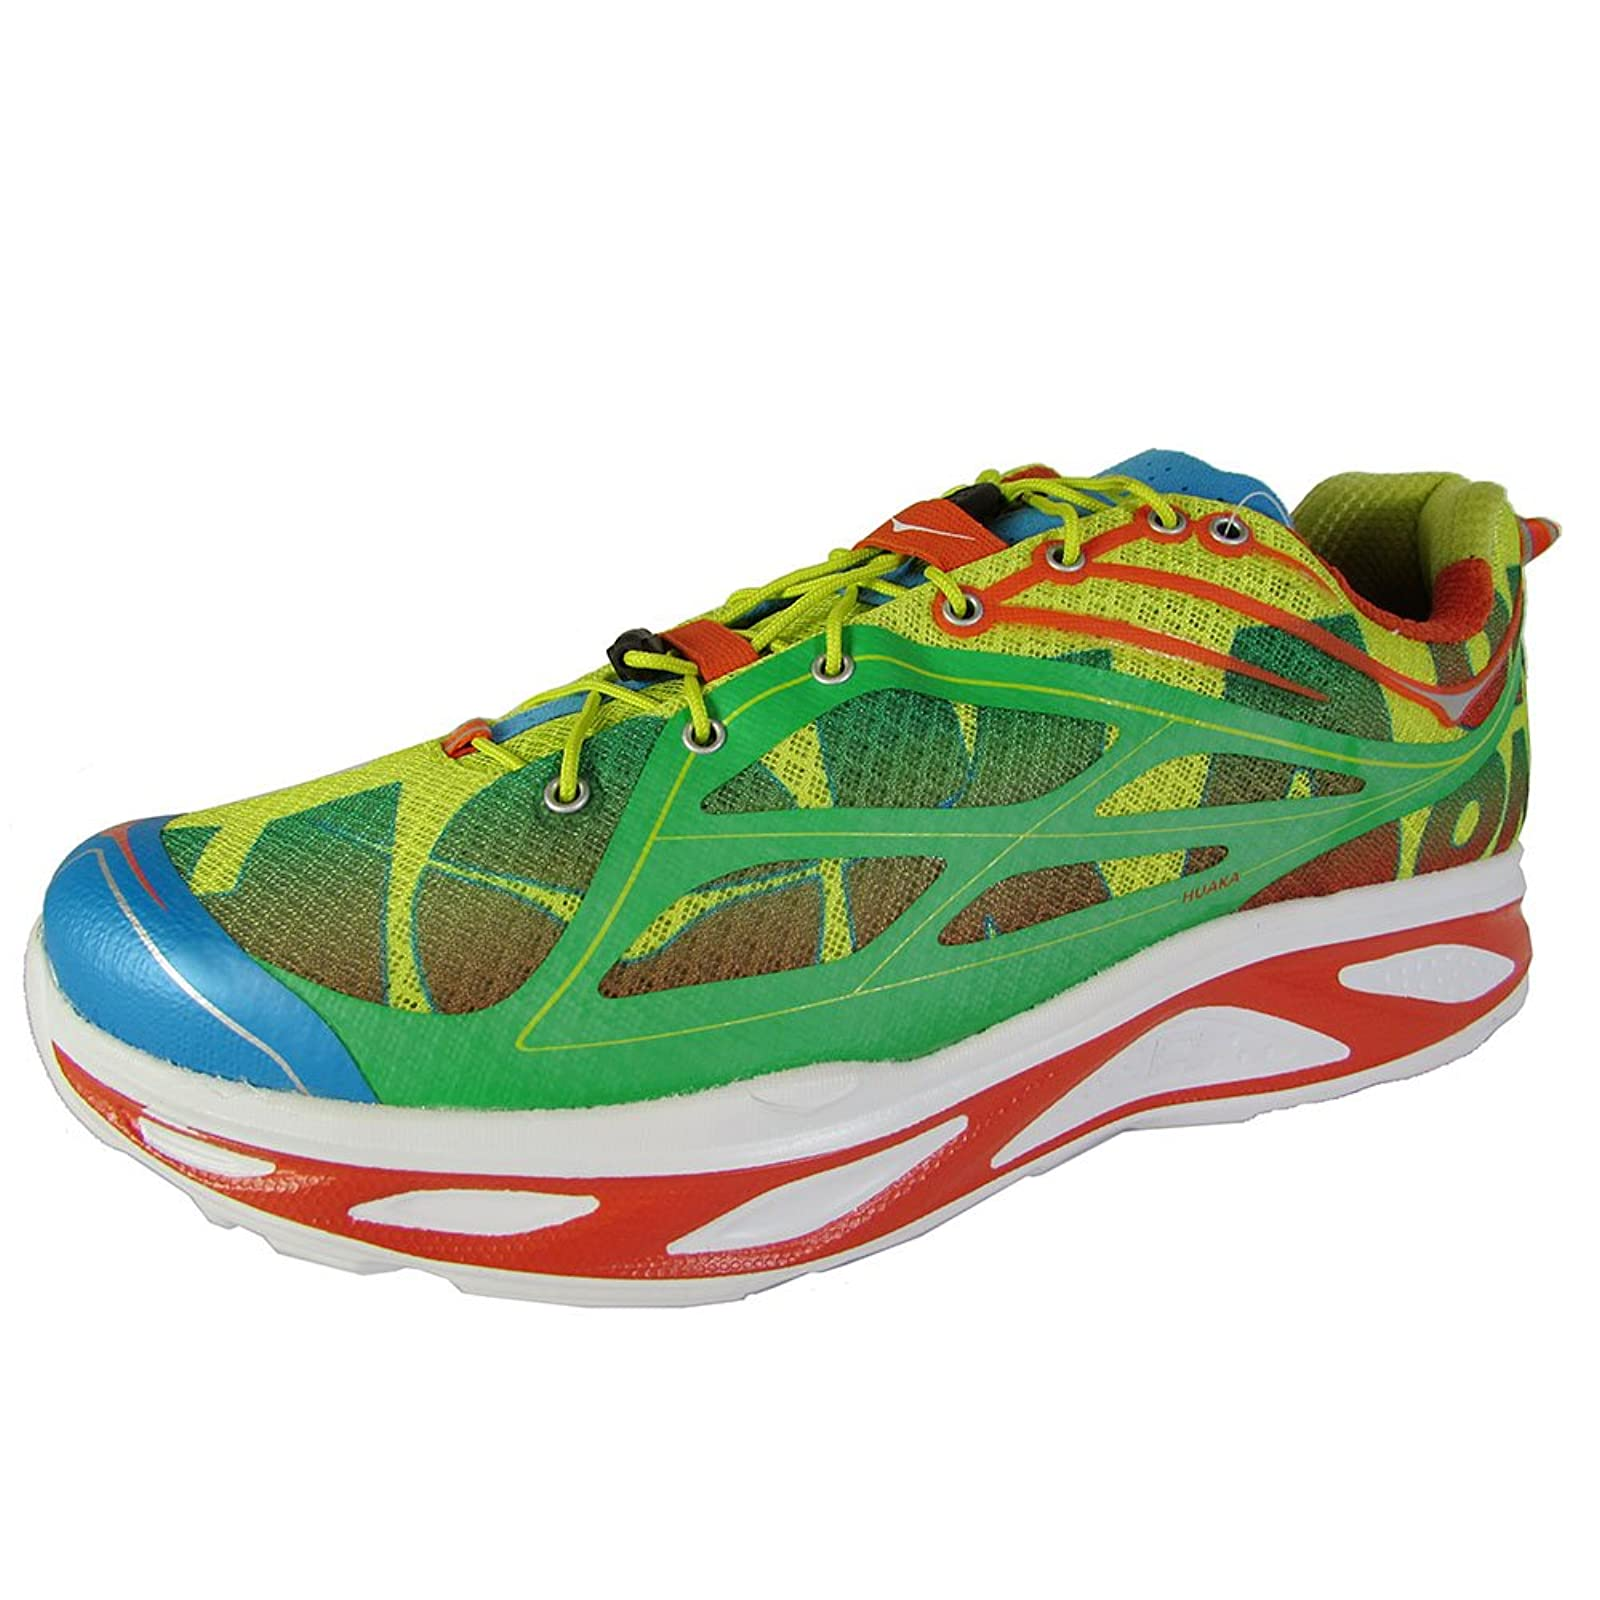 HOKA ONE ONE Mens Huaka Running Sneaker Shoe 8 M US - 2